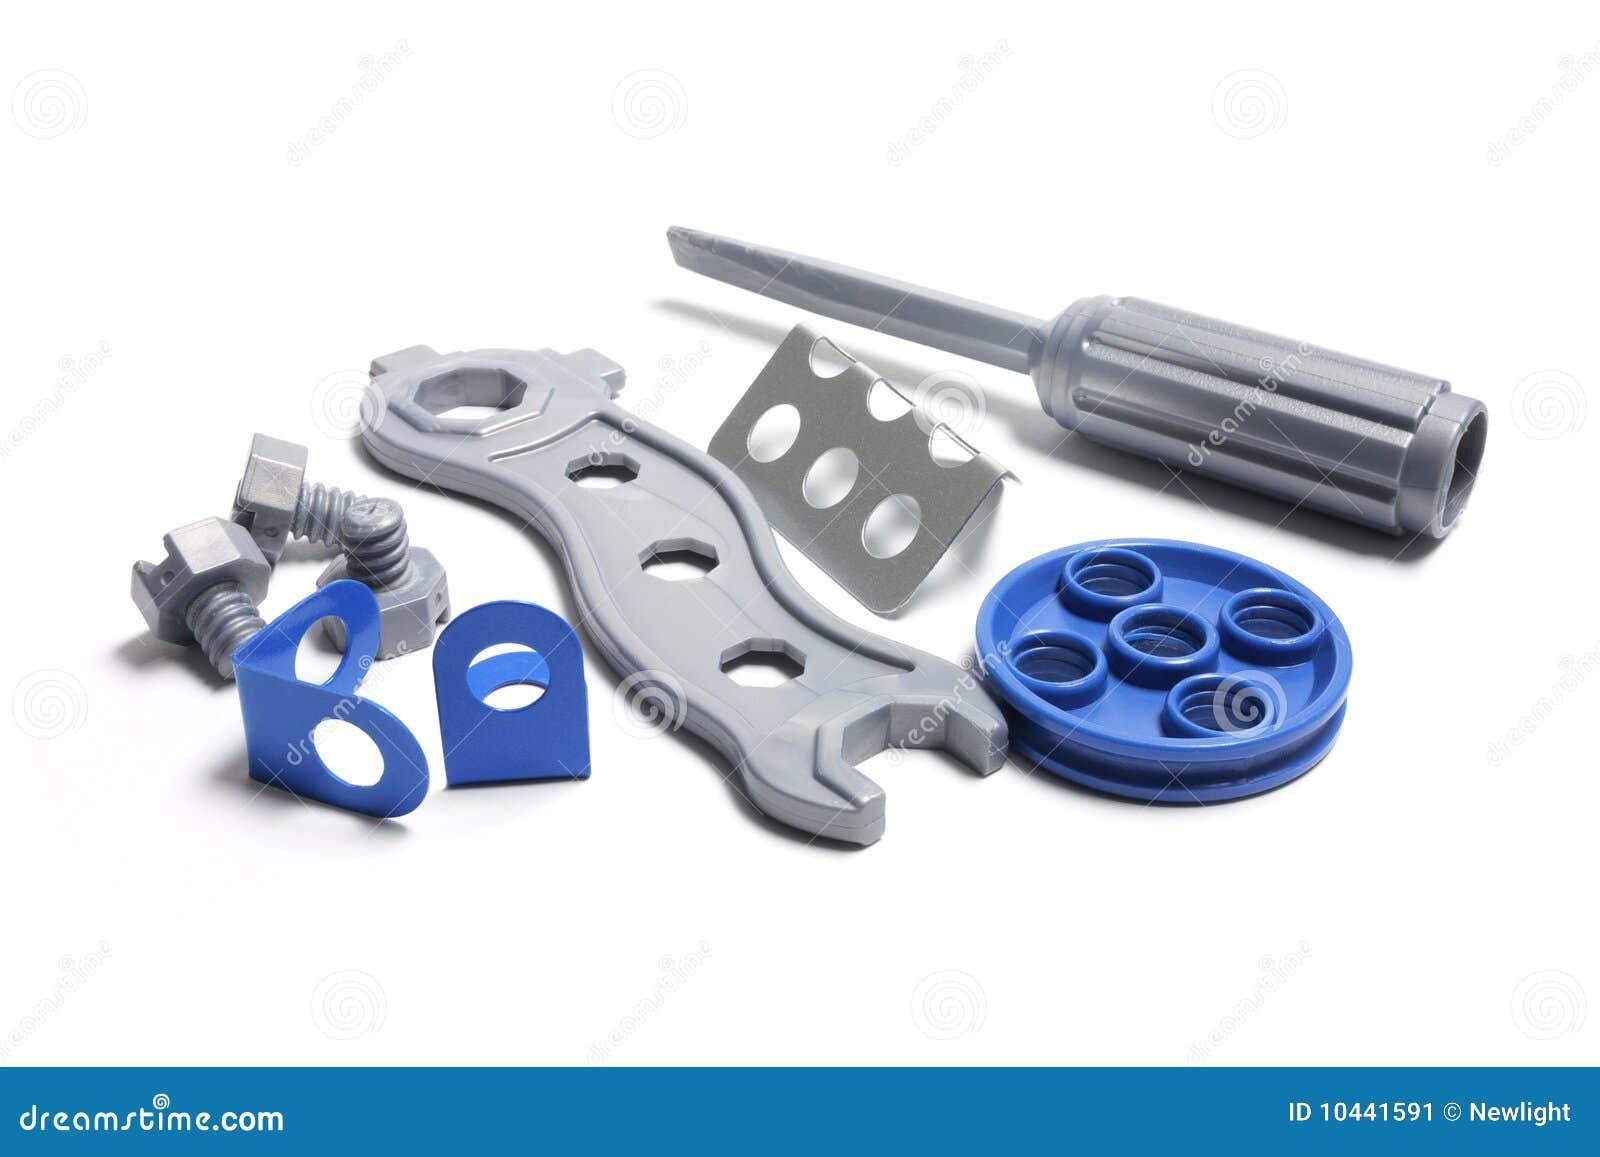 Plastic Toy Tools : Plastic toy tools stock image